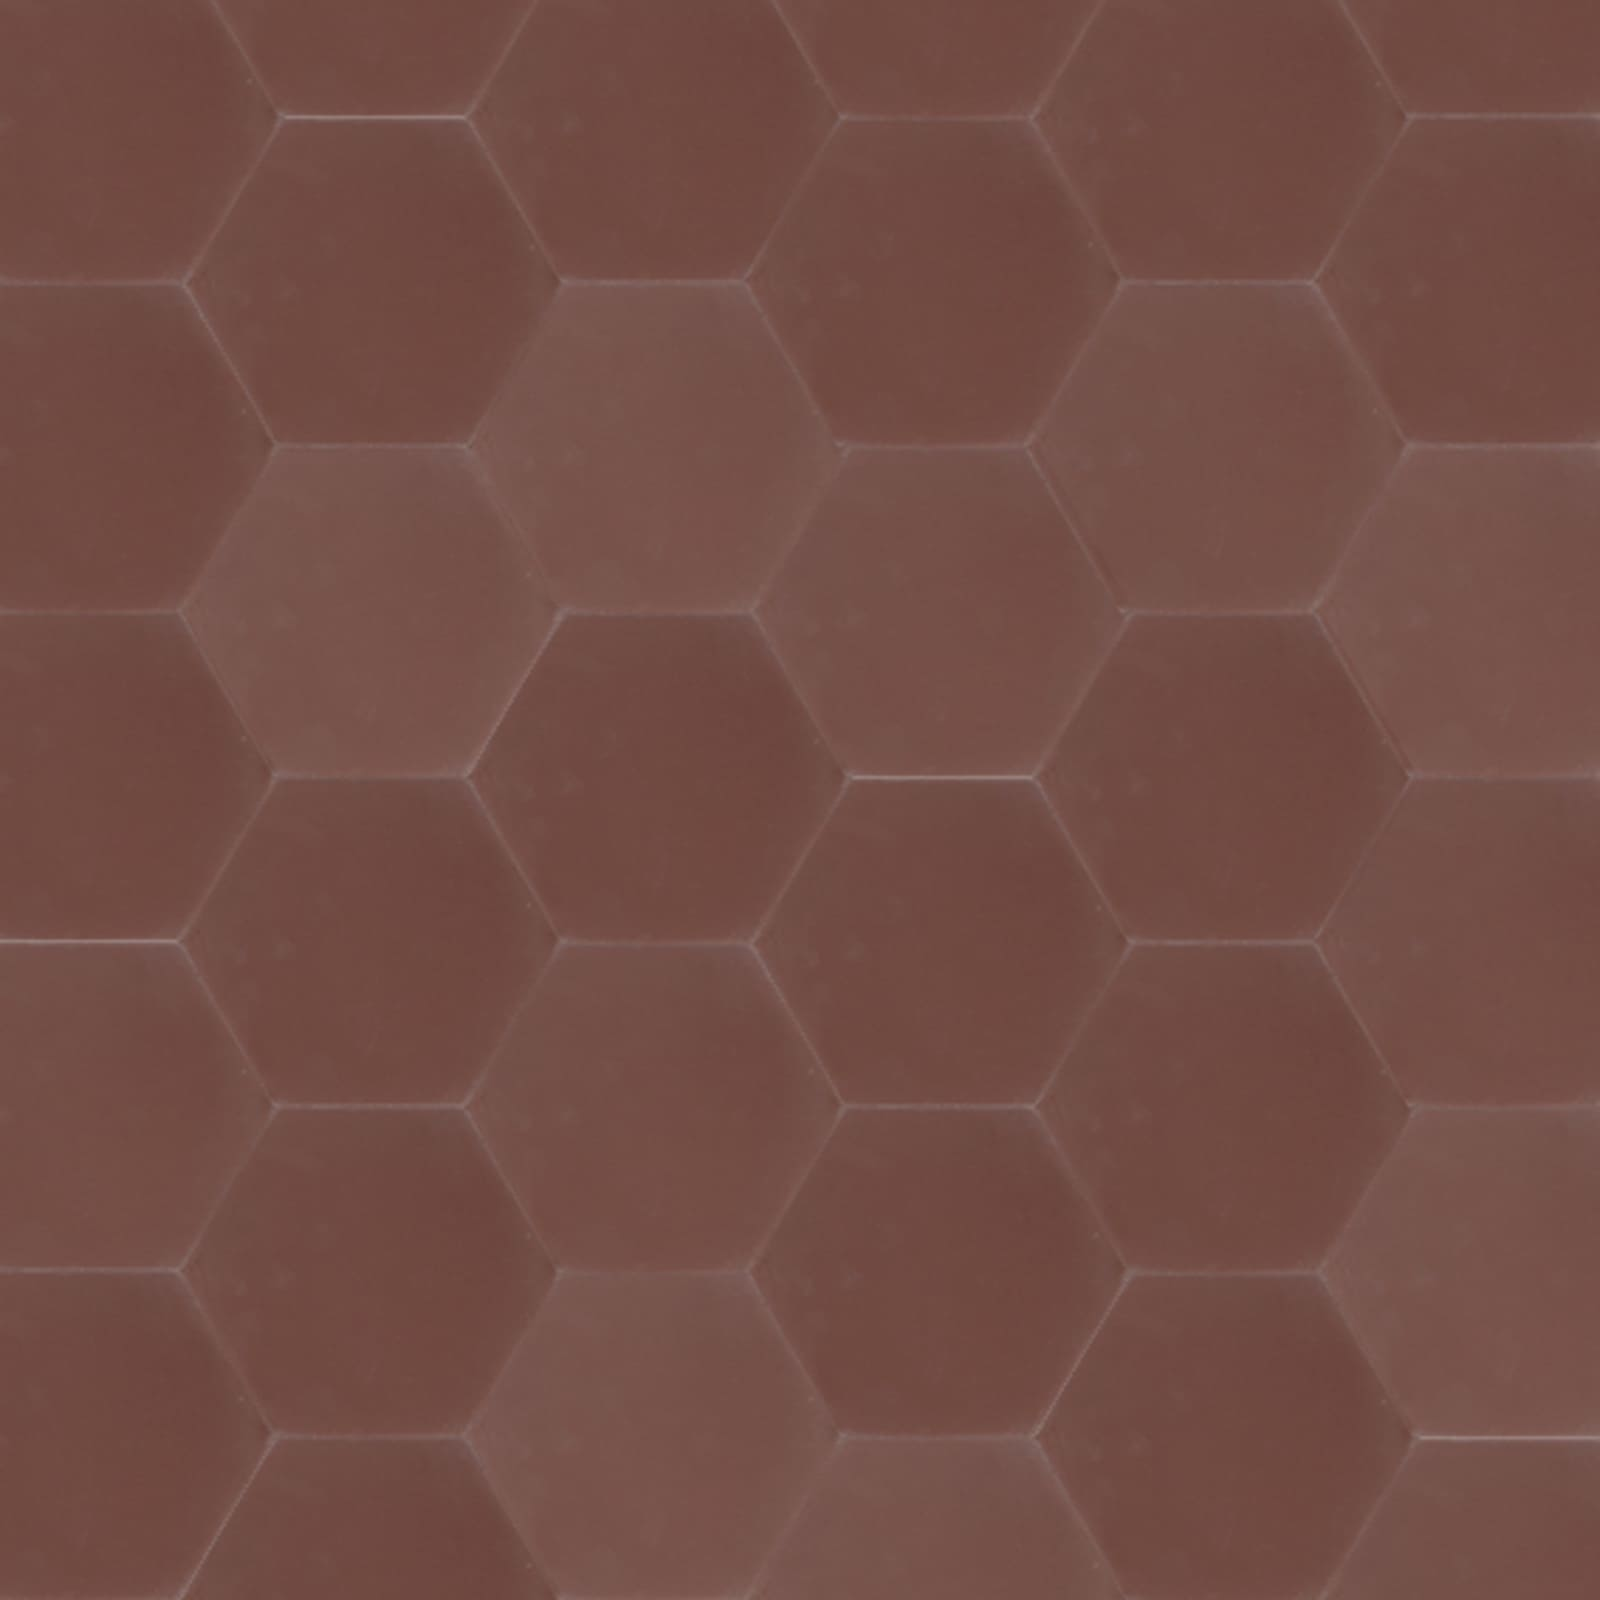 zementfliesen-terrazzofliesen-kreidefarbe-terrazzo-fugenlos-viaplatten-6-34   6-34